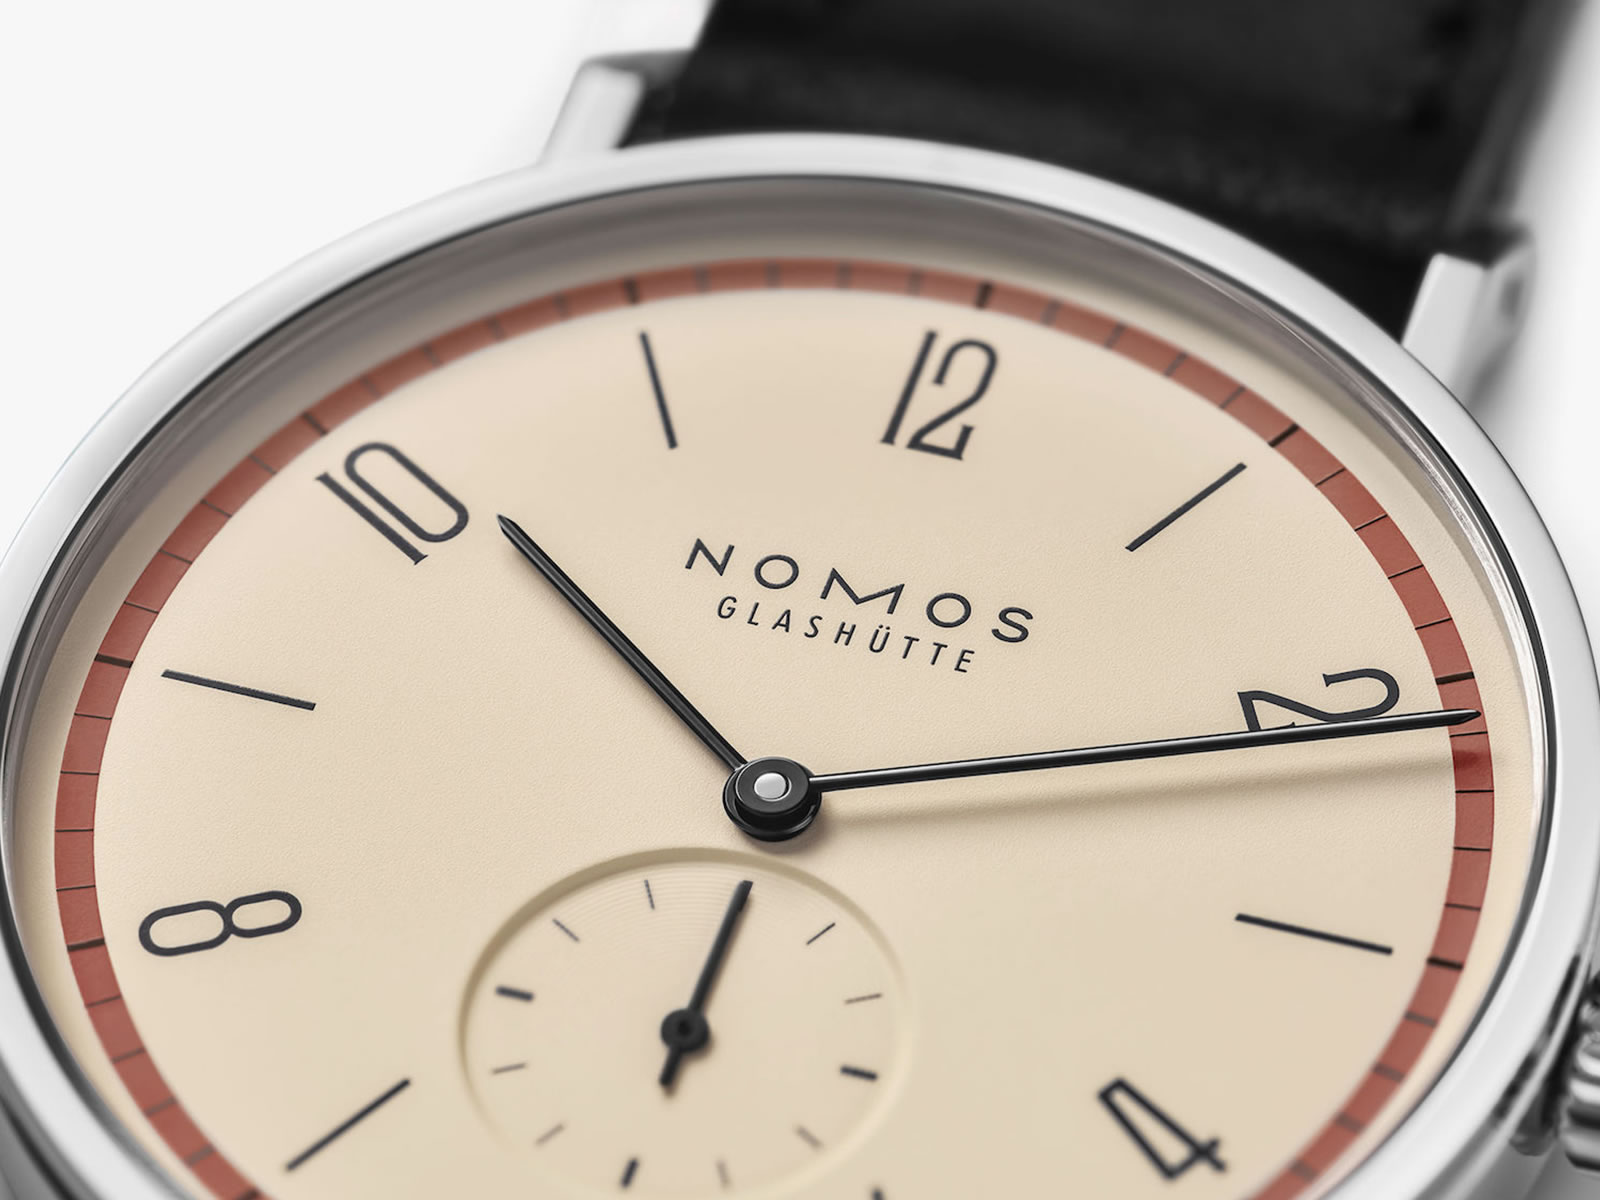 165-s4-nomos-glashutte-tangente-bauhaus-3-.jpg